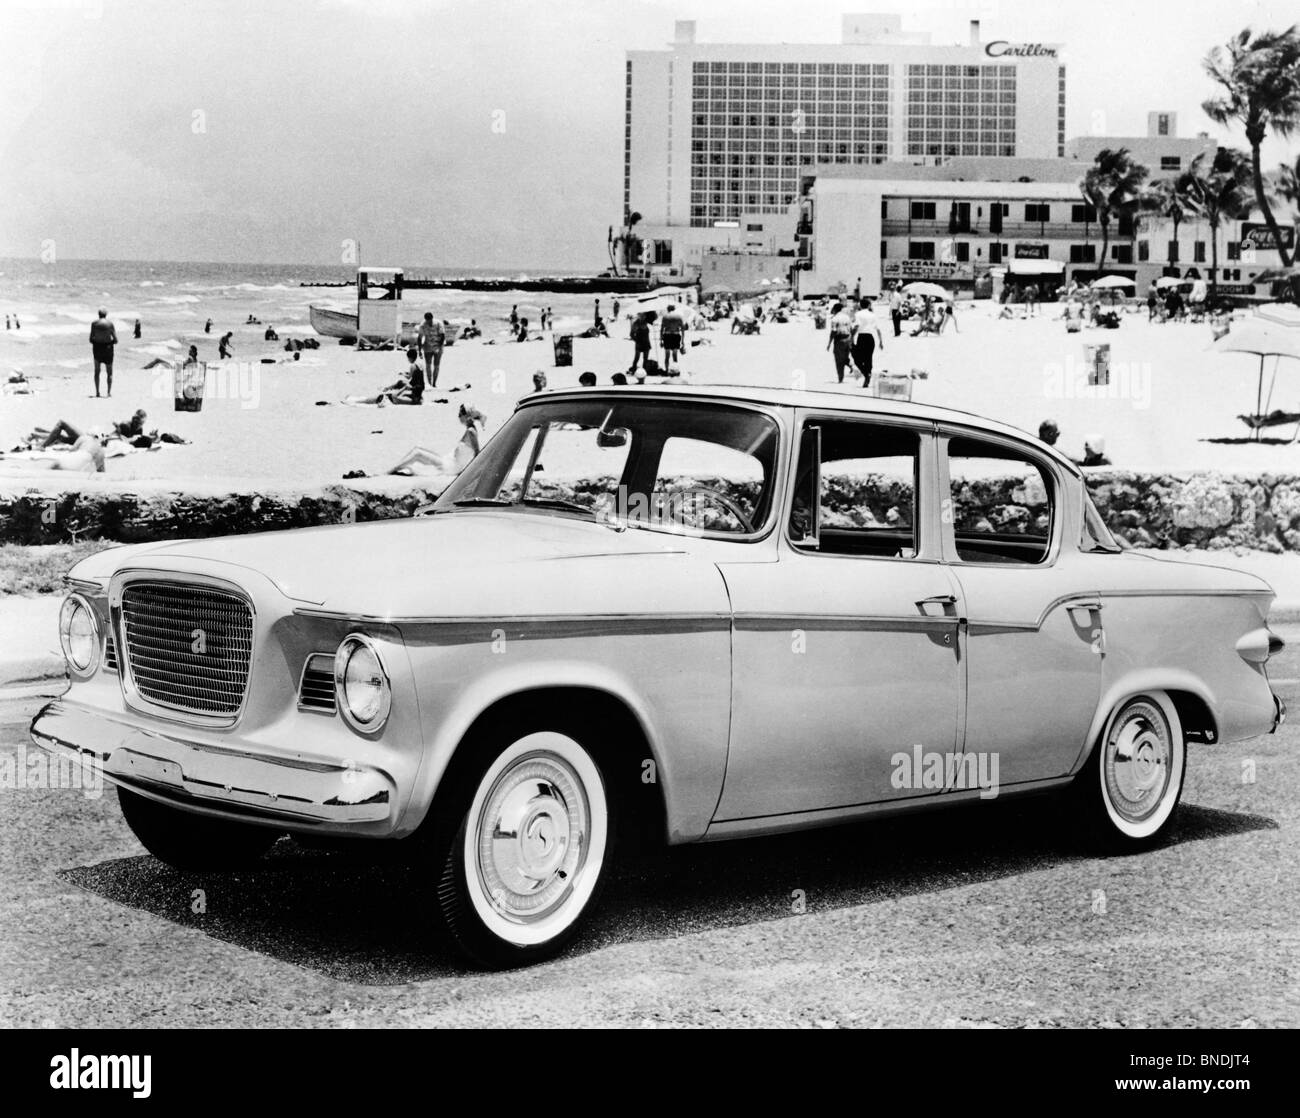 Vintage car parked on road, Studebaker Lark, 1959 - Stock Image